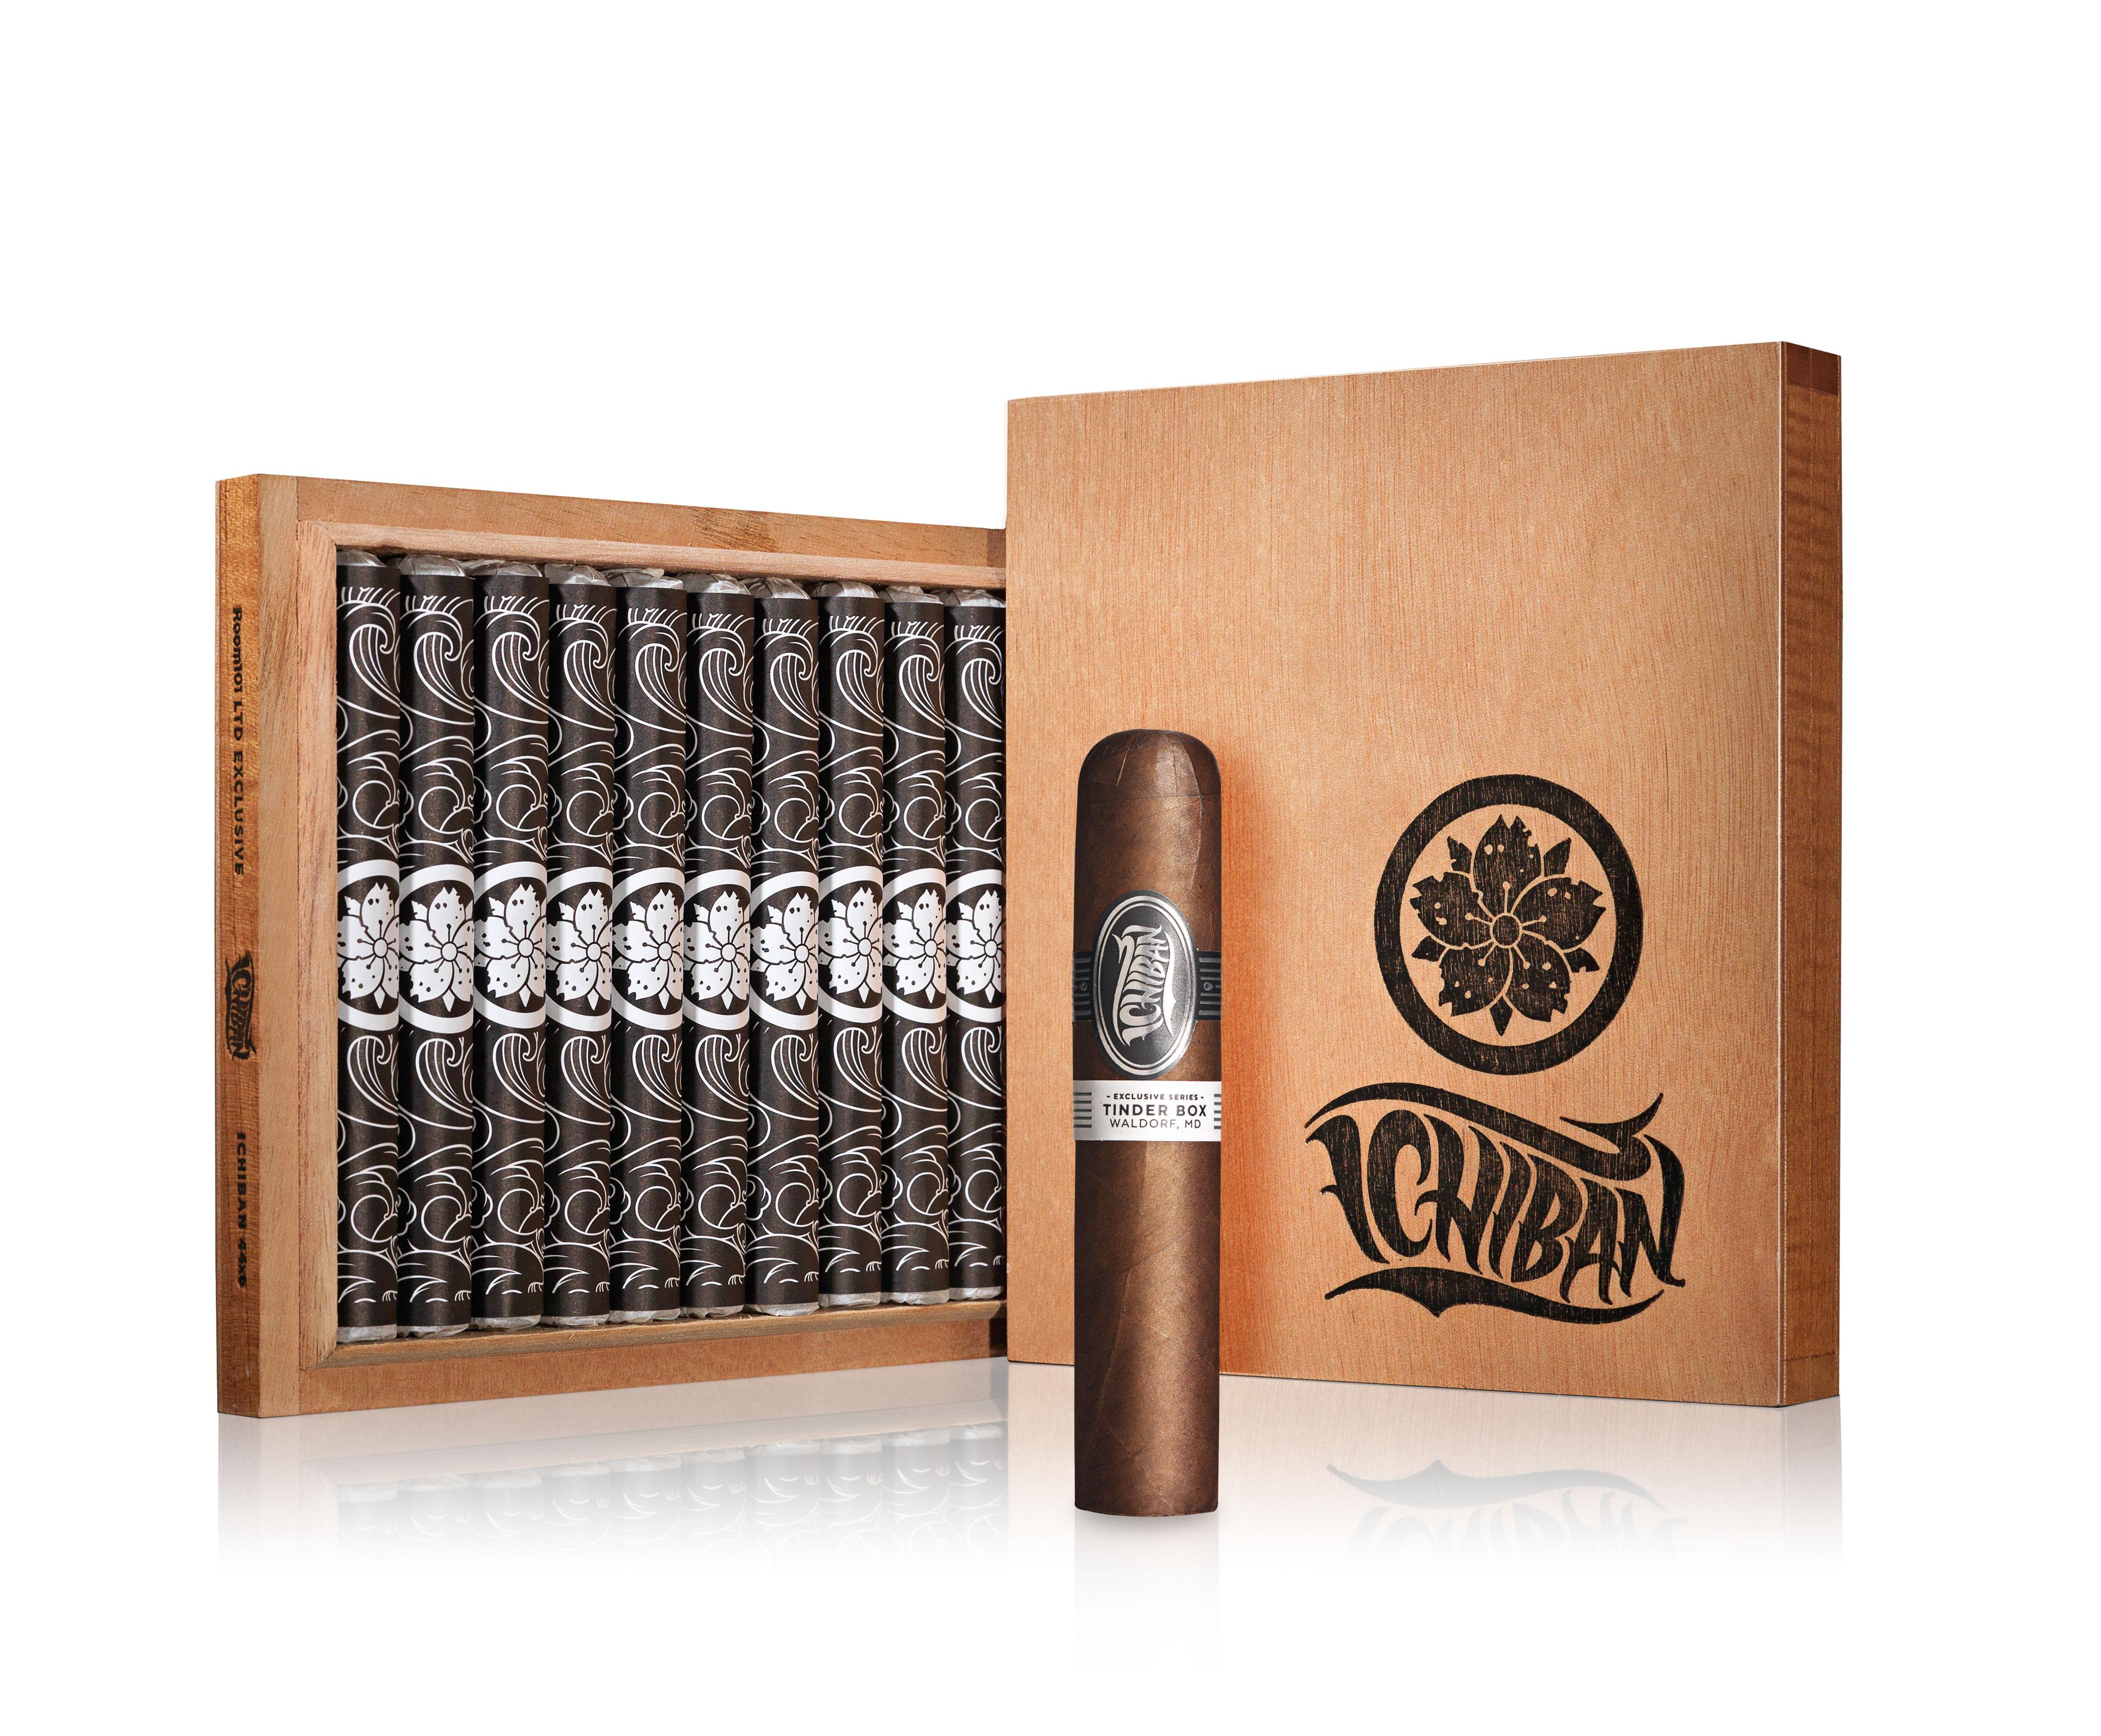 Cigar News: Room 101 Ichiban Monstro Becomes Shop Exclusive to Tinder Box Waldorf